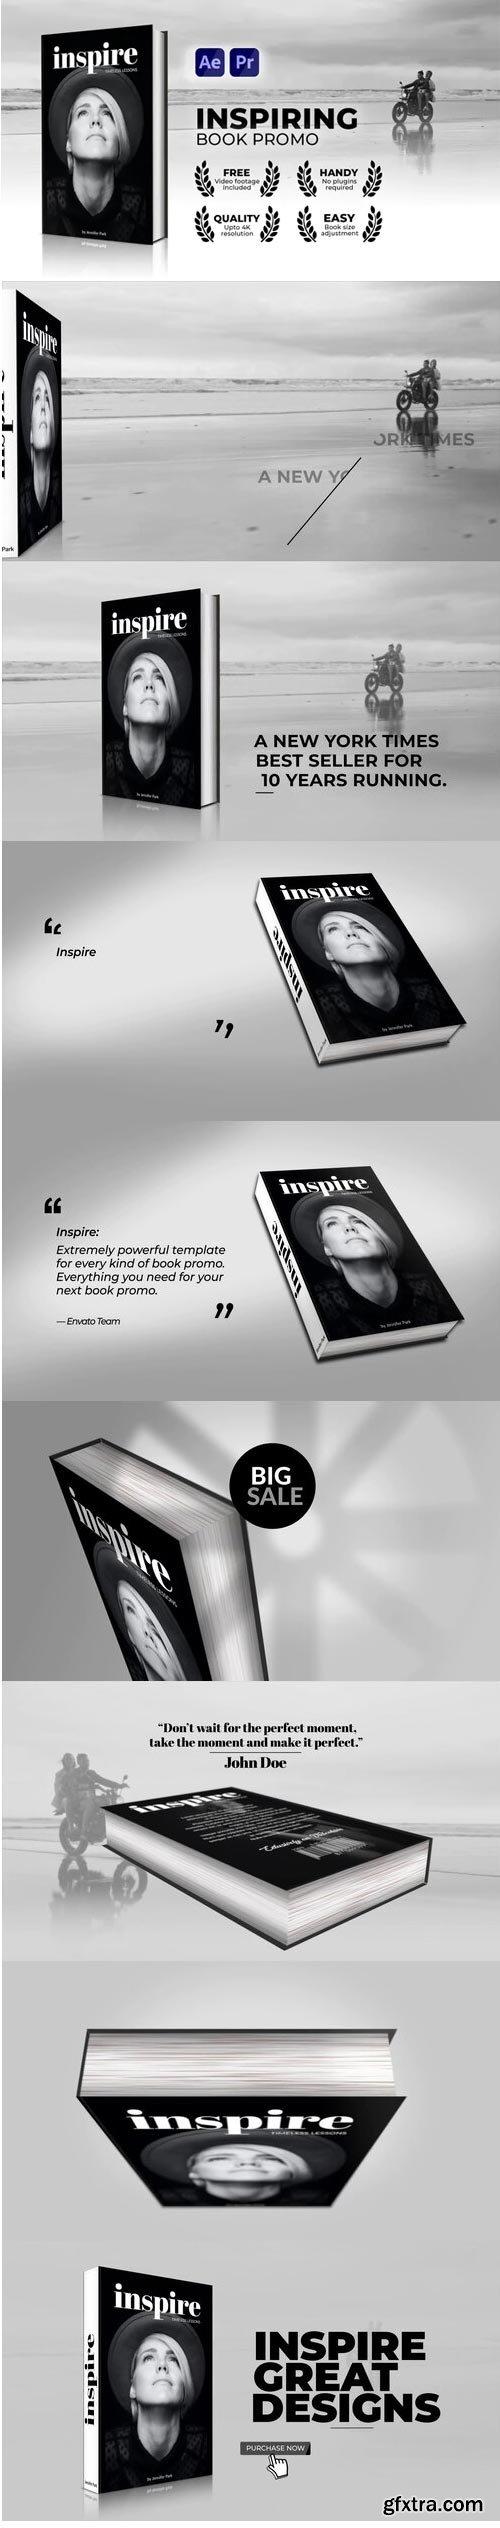 Videohive - Inspiring Book Promo - 32710906